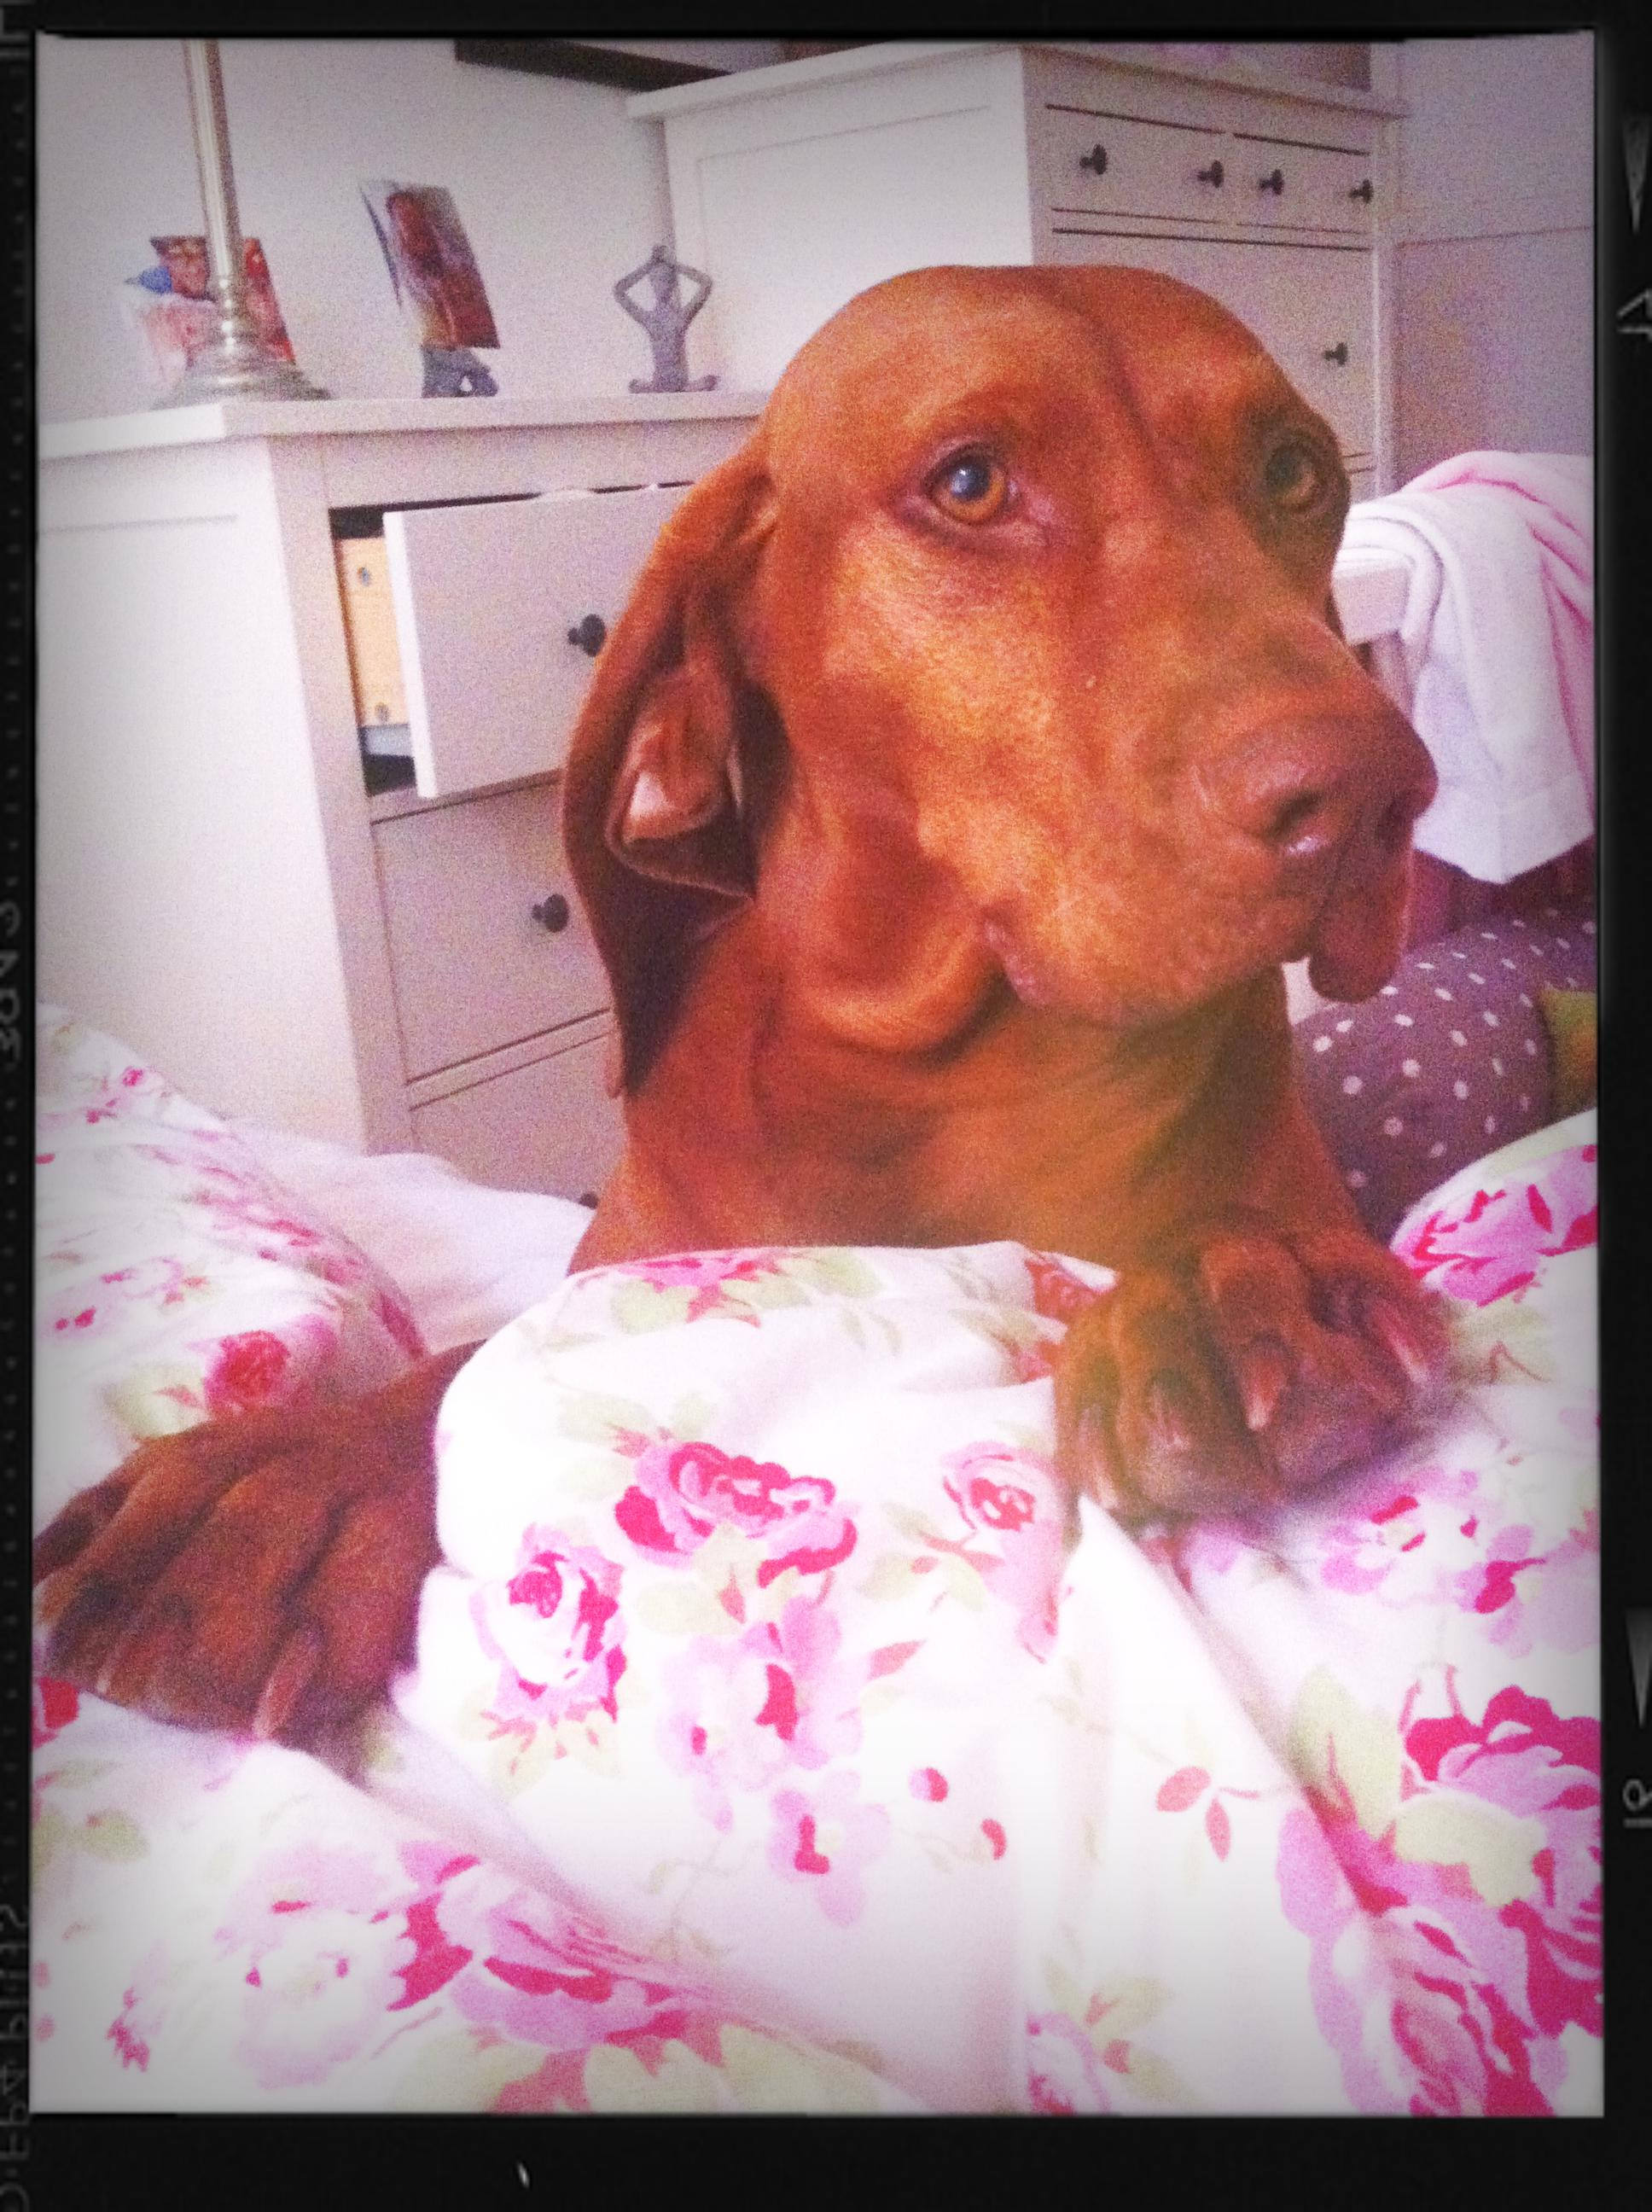 Viszla Hündin Stella faul auf dem Bett